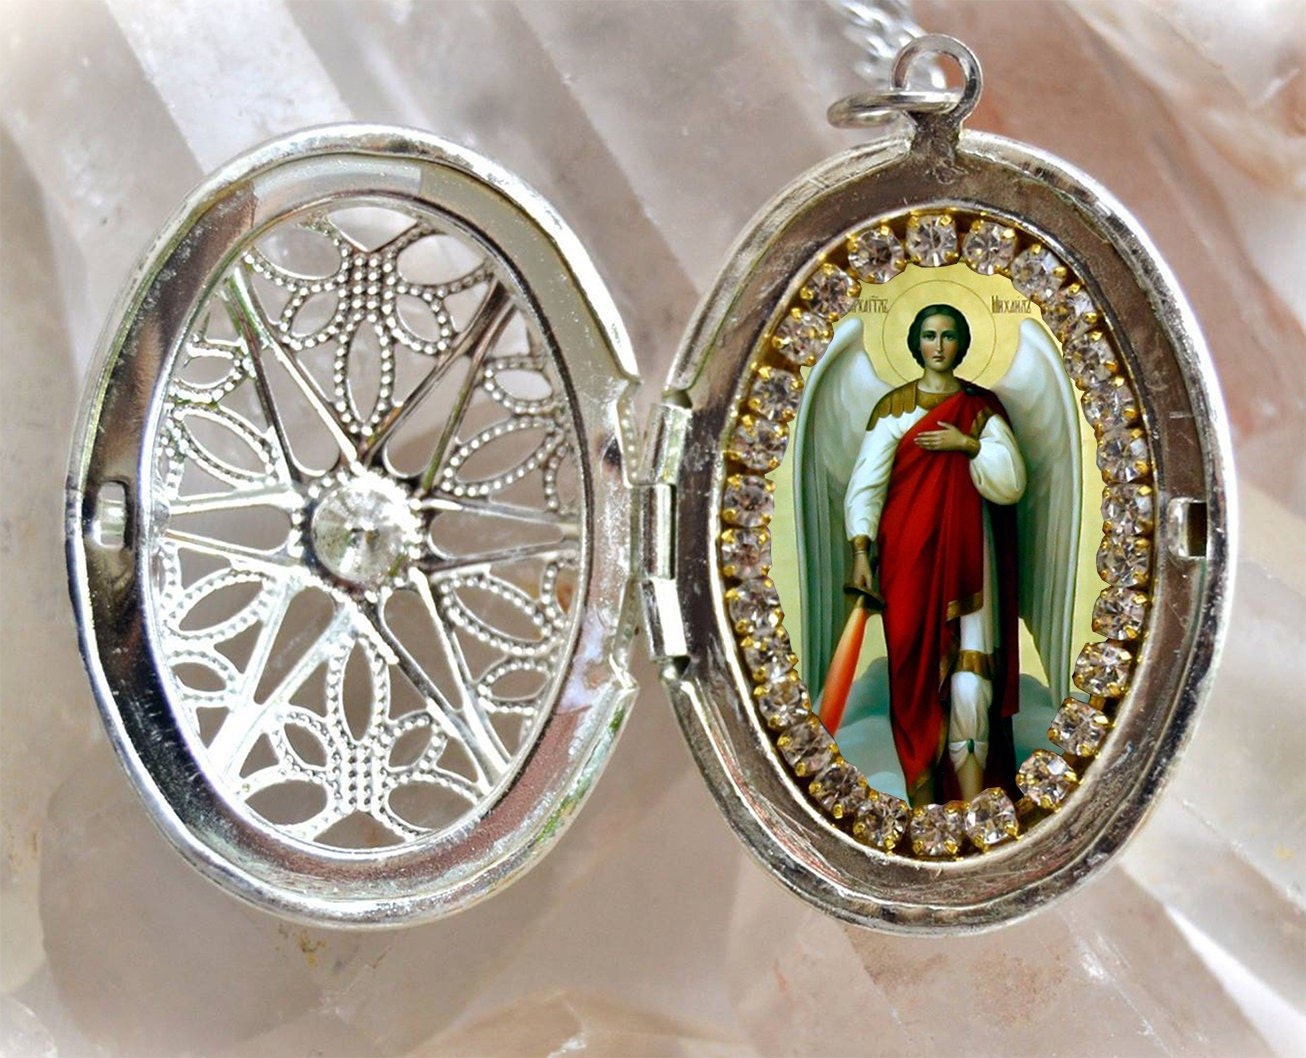 St michael archangel handmade locket necklace catholic christian st michael archangel handmade locket necklace catholic christian religious jewelry medal scapular pendant aloadofball Gallery